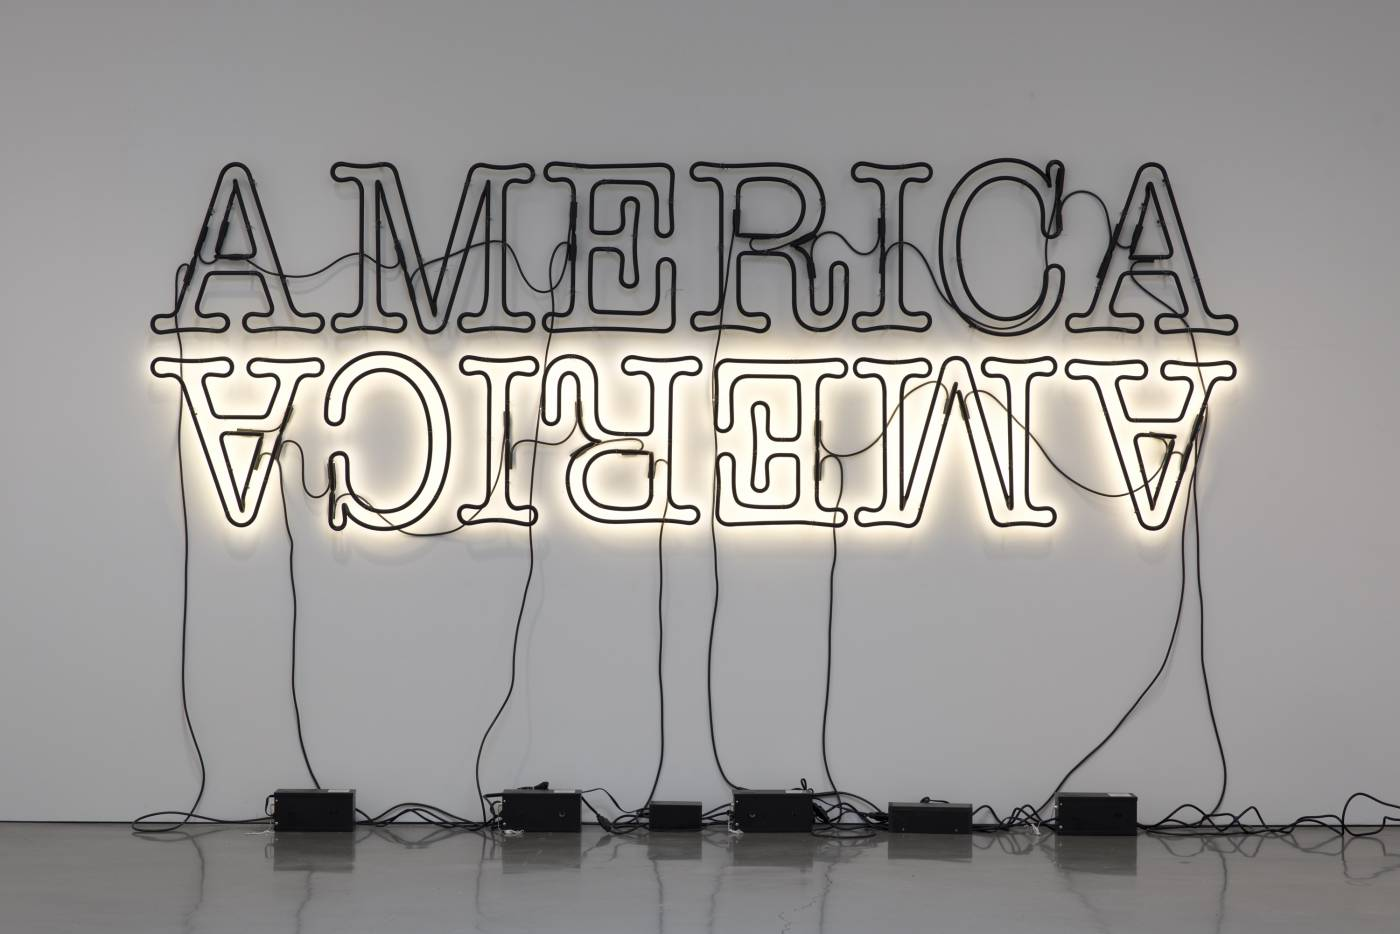 Glenn Ligon, Double America 2, © Glenn Ligon; Image courtesy of the artist, Luhring Augustine, New York, Regen Projects, Los Angeles, and Thomas Dane Gallery, London.